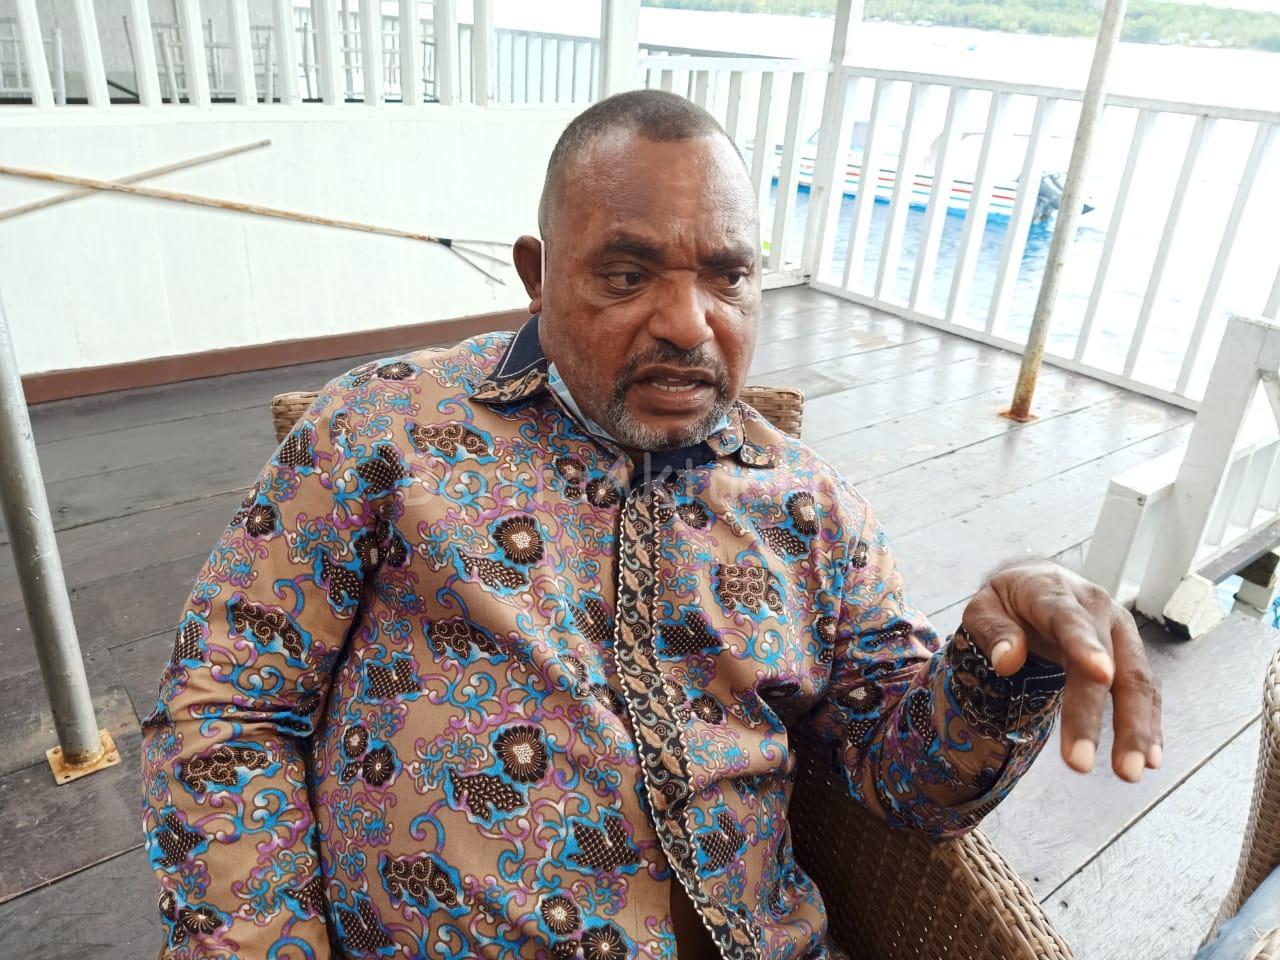 Jimmy Idjie: Kepala Daerah di Papua Barat Harus Contohi Bupati Paniai 1 IMG 20200805 WA0051